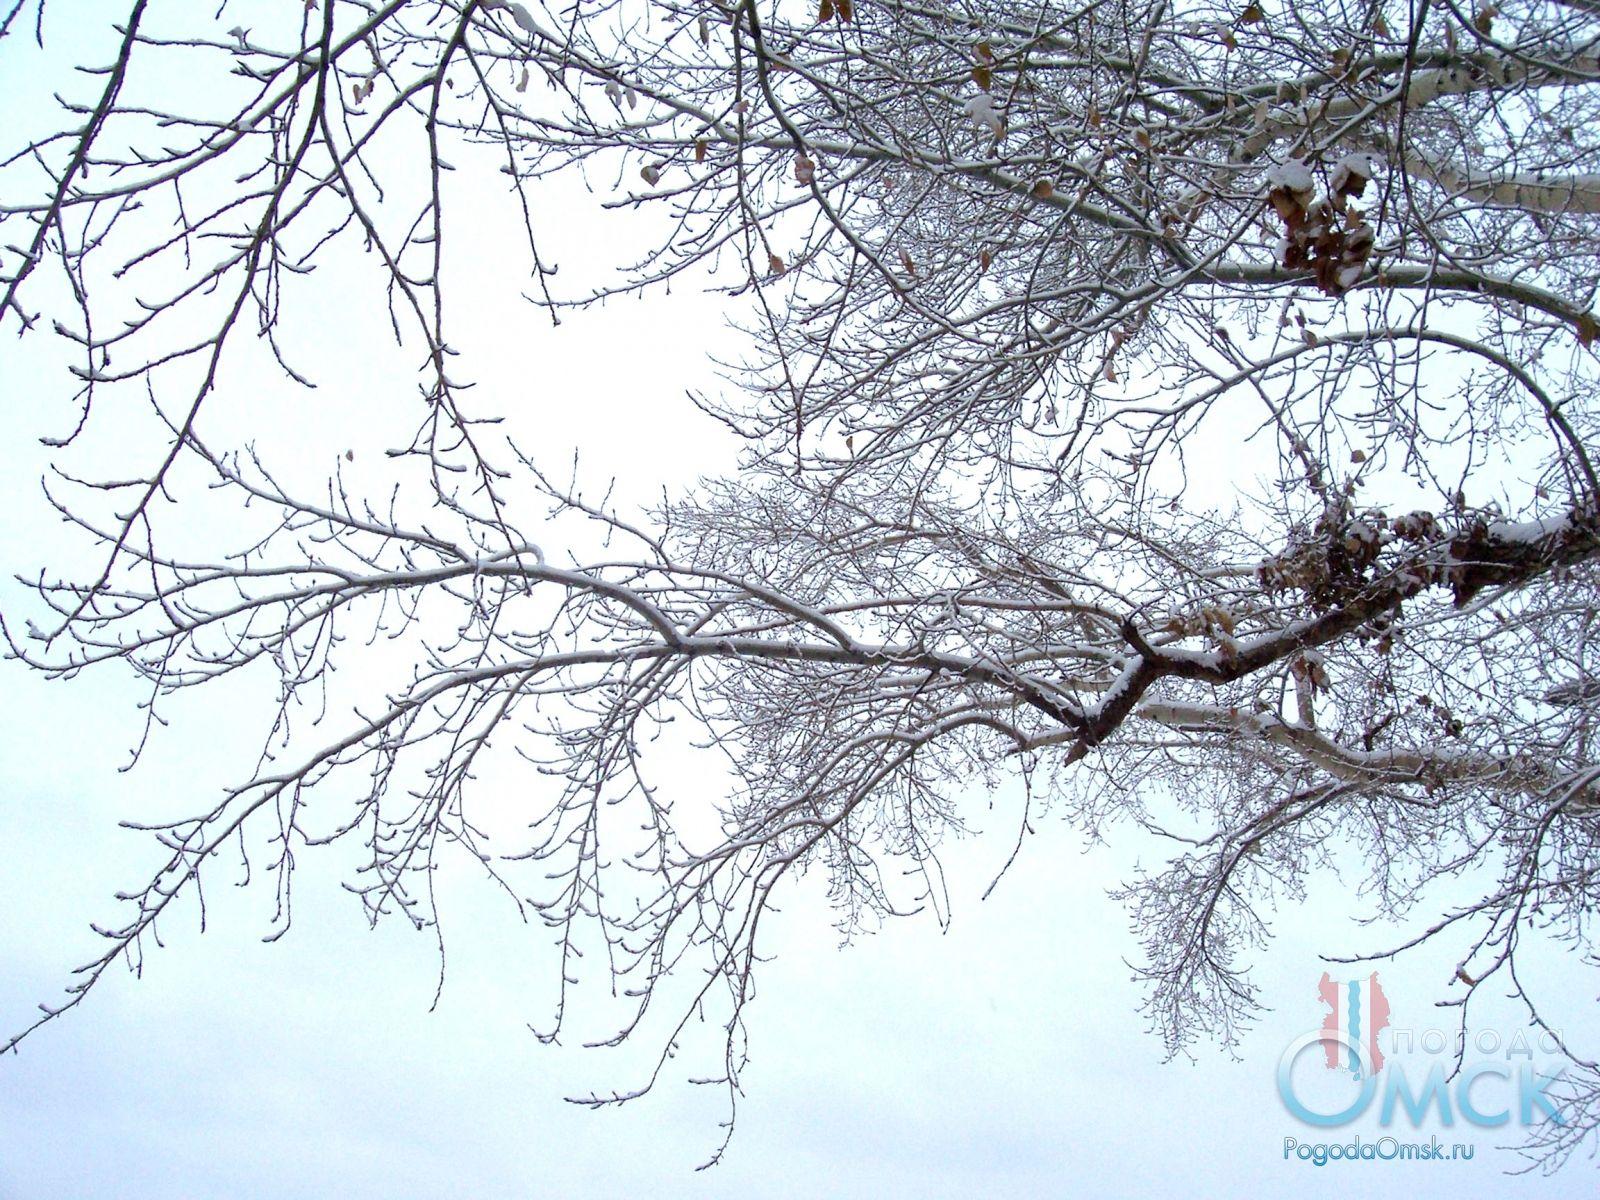 Снег на ветвях дерева